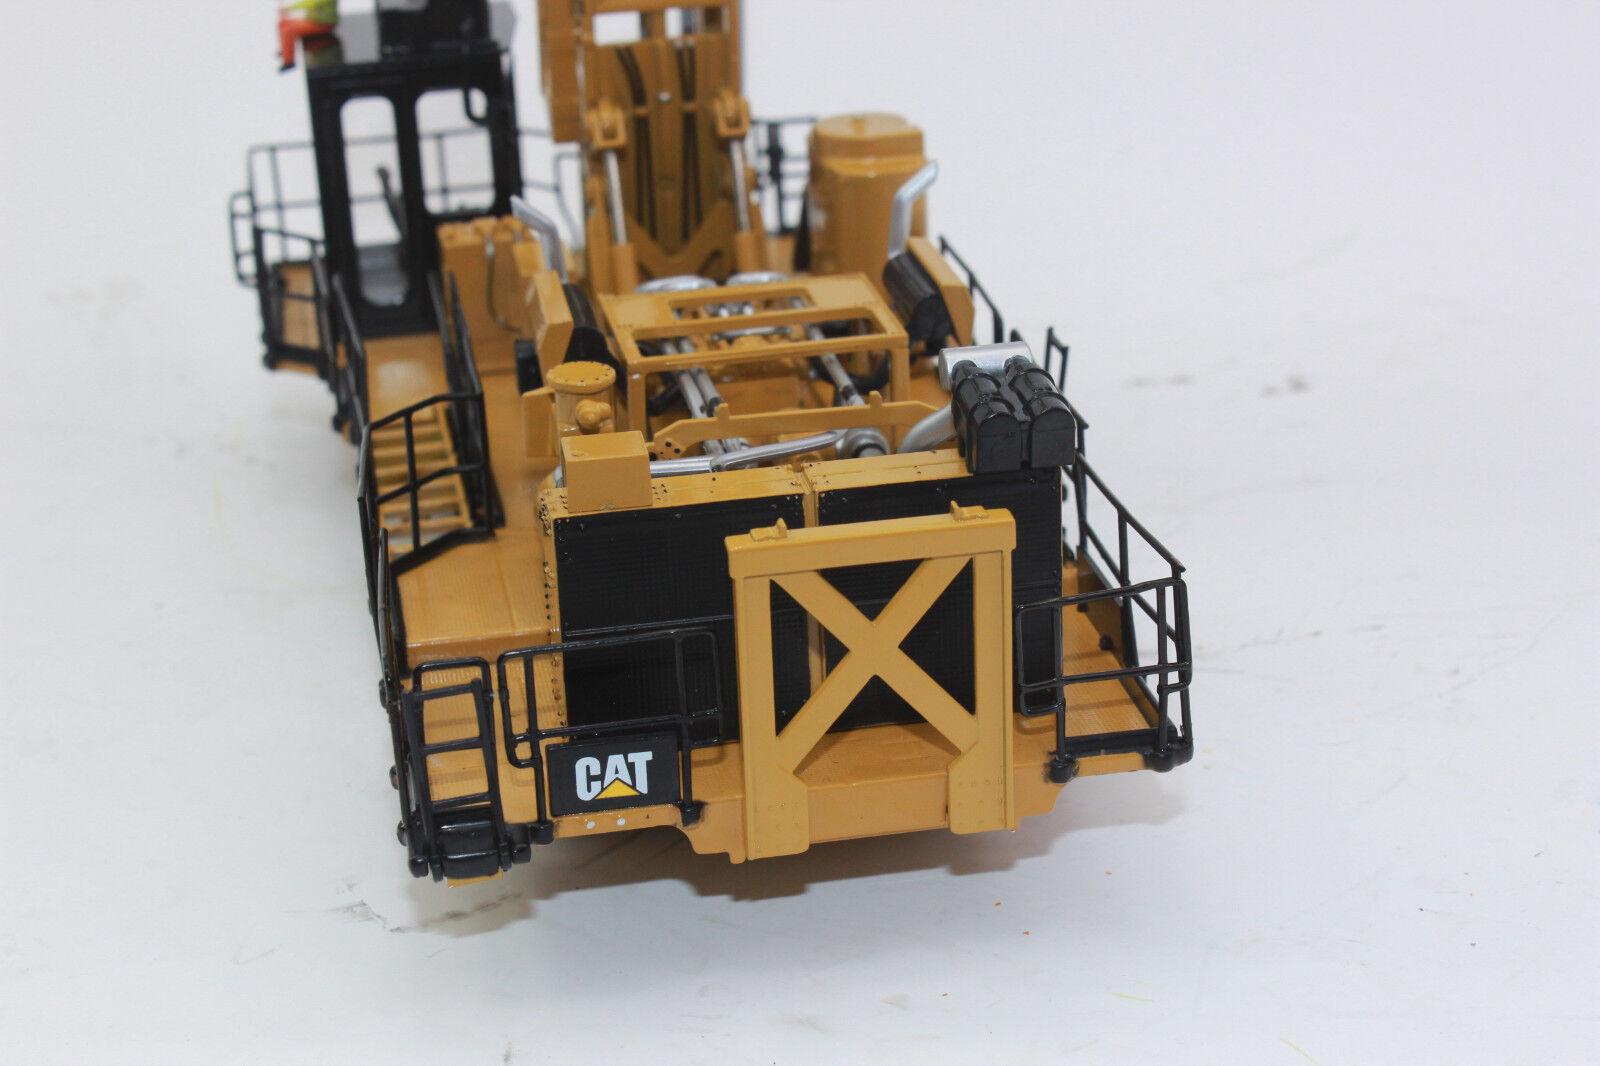 Diecast Masters 85581 dispositivo di foratura CAT Caterpillar Caterpillar Caterpillar MD 6250 rossoary Blast Hole 1 50 d5dd53